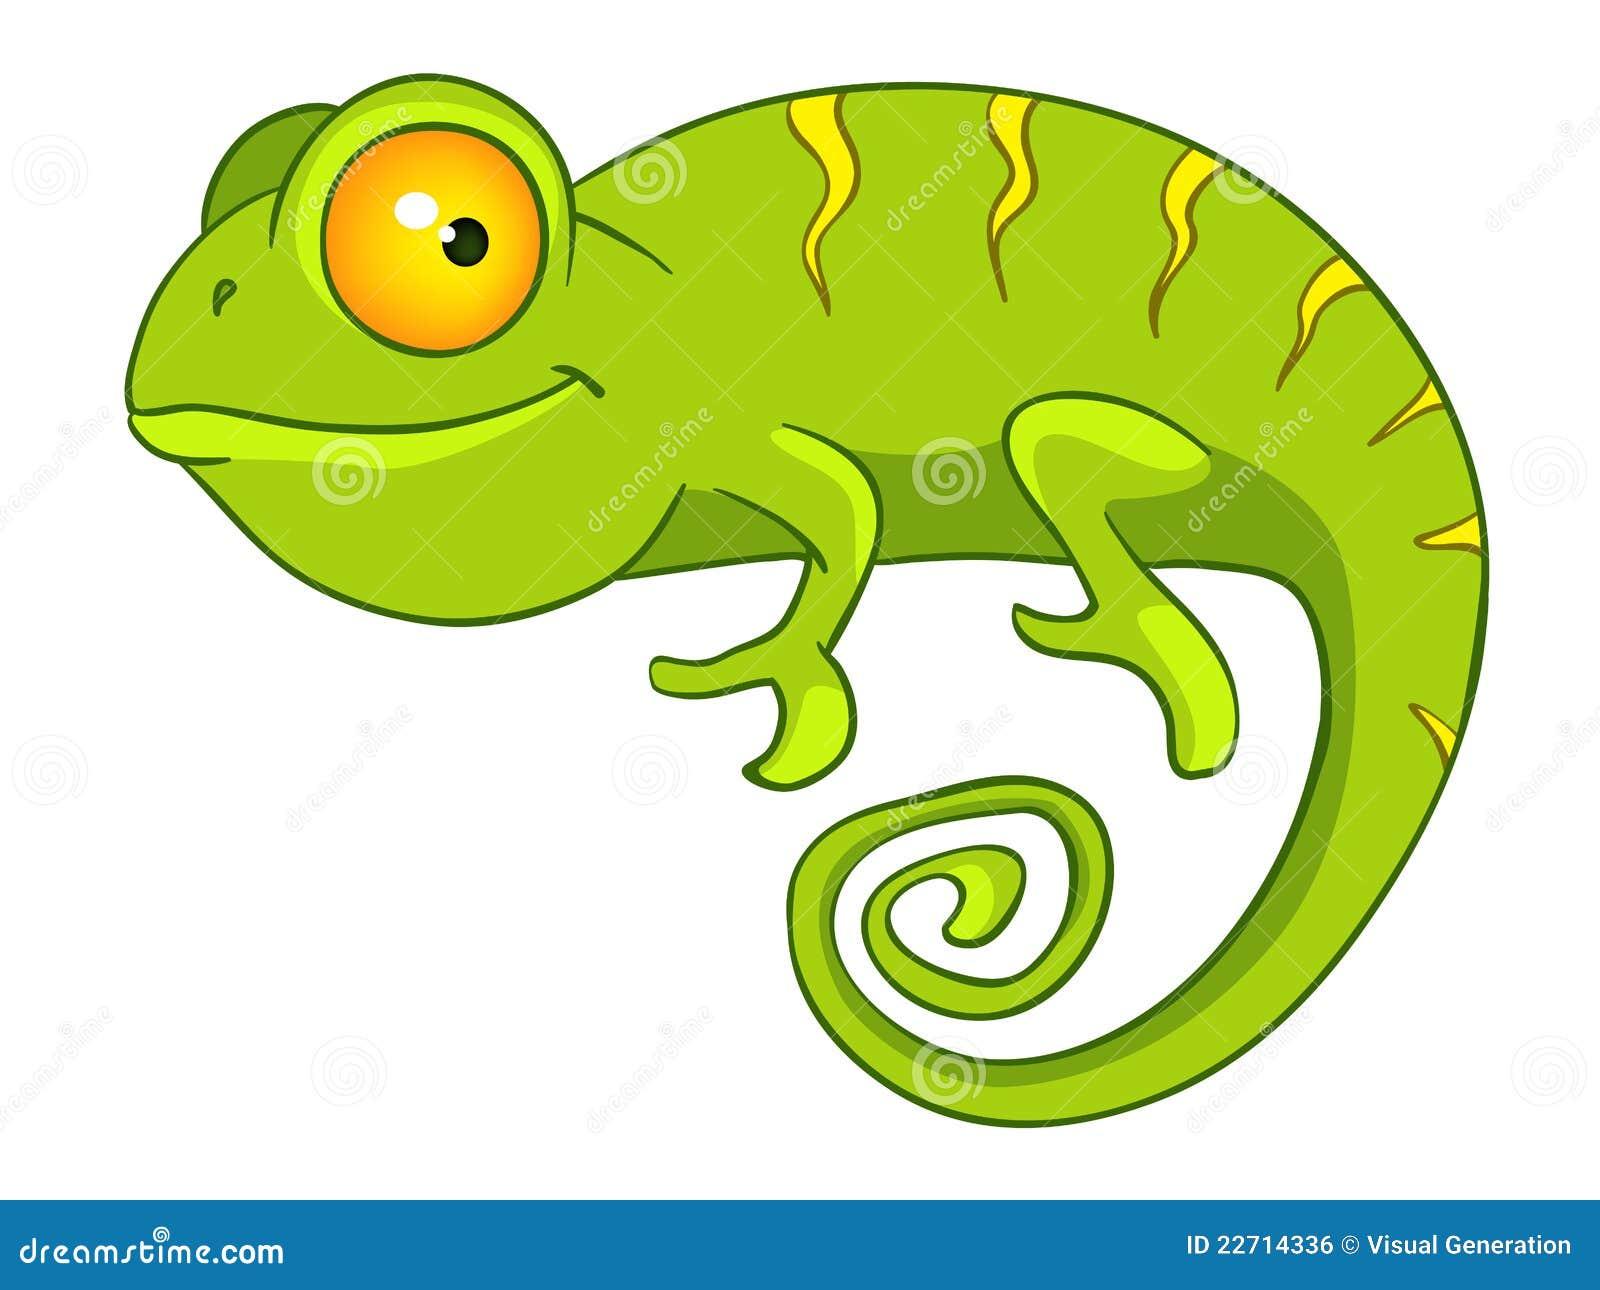 Royalty Free Stock Image: Cartoon Character Chameleon. Image: 22714336